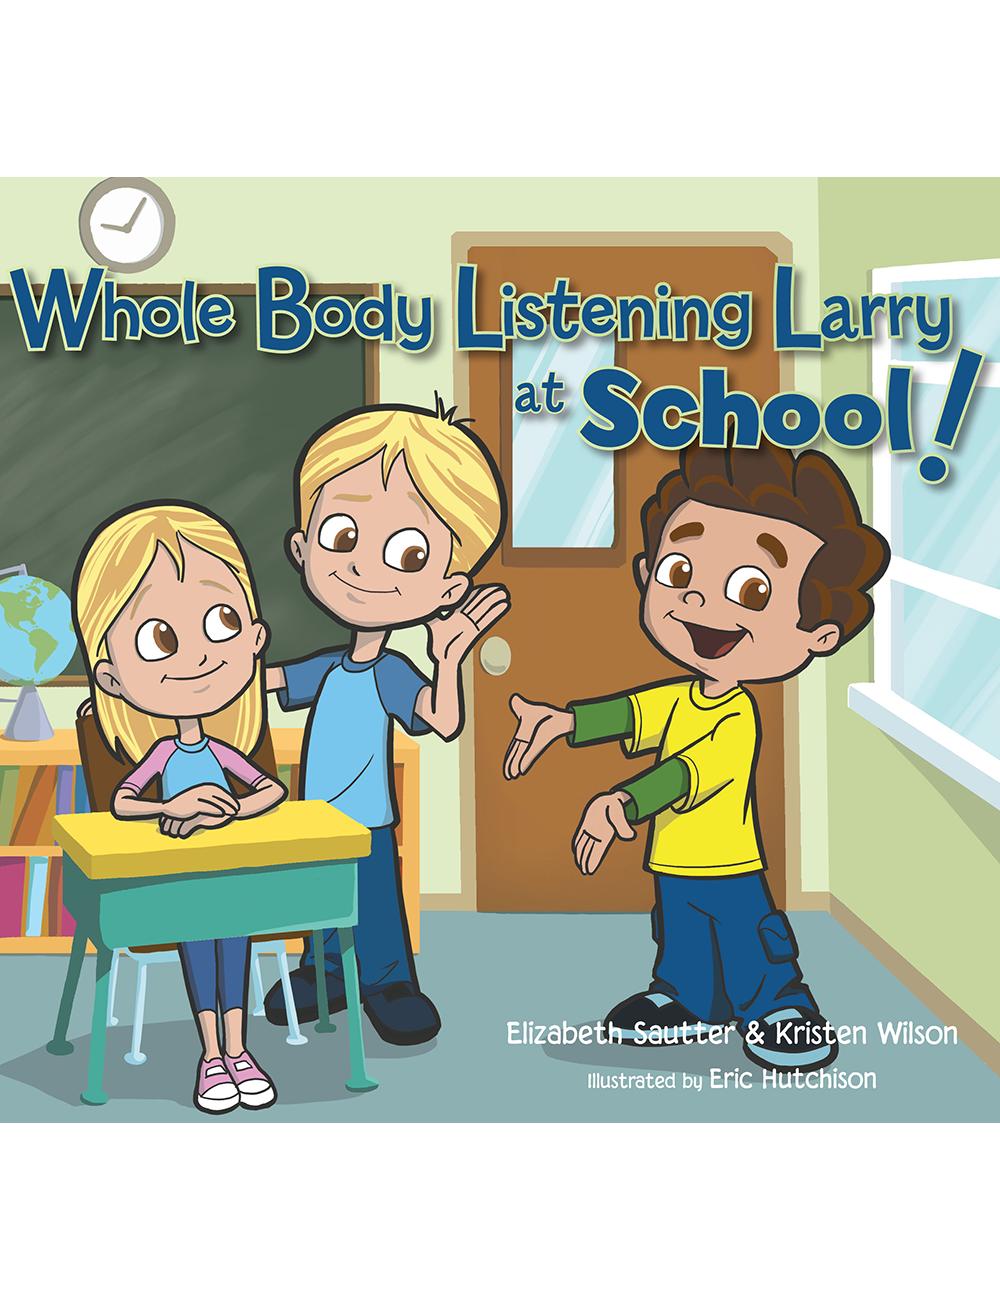 Kindergarten clipart social emotional learning. Socialthinking the incredible flexible